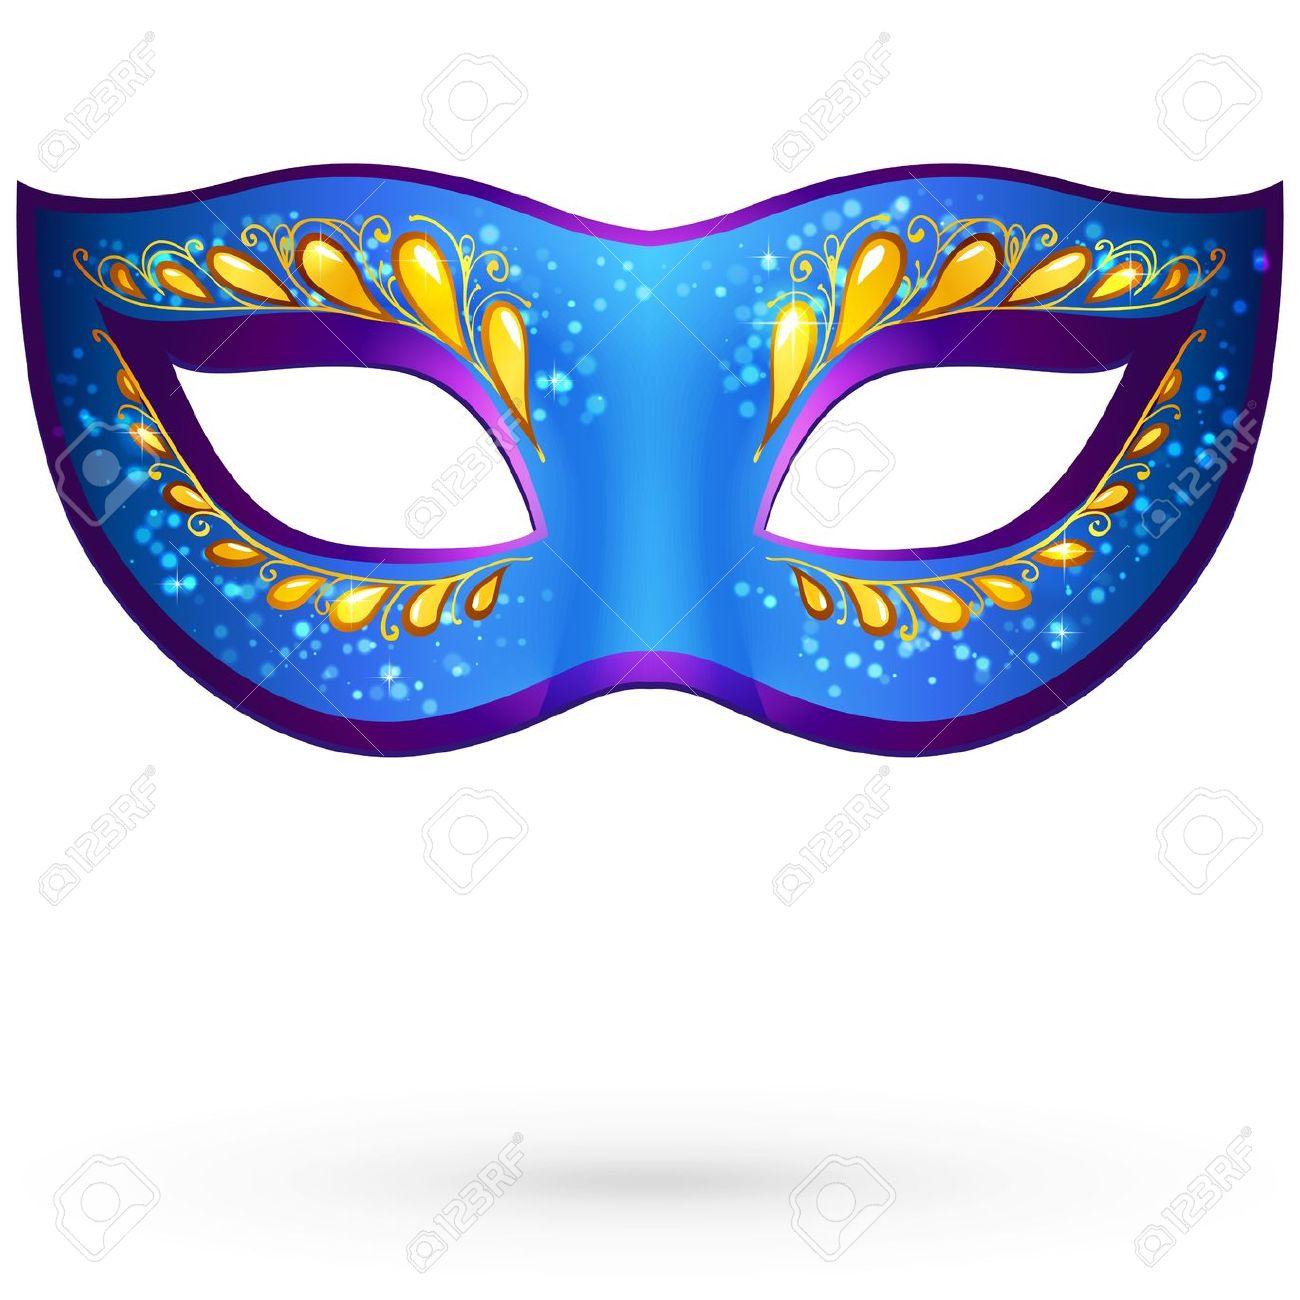 Carneval clipart venetian mask Mask Mask Clipart Venetian Clipart